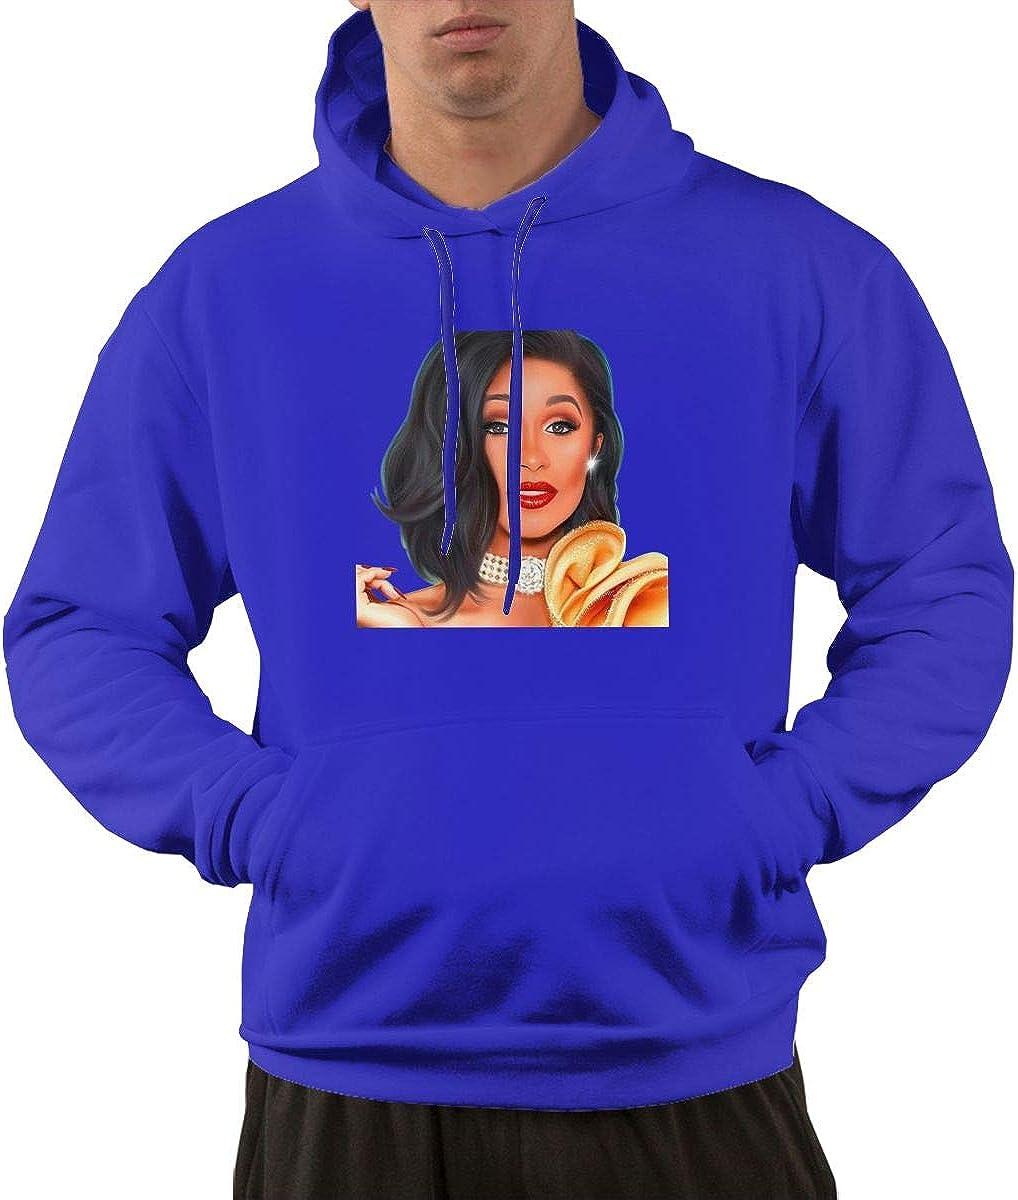 JEEZORN Casual Cardi B Sweatshirt for Mans Black